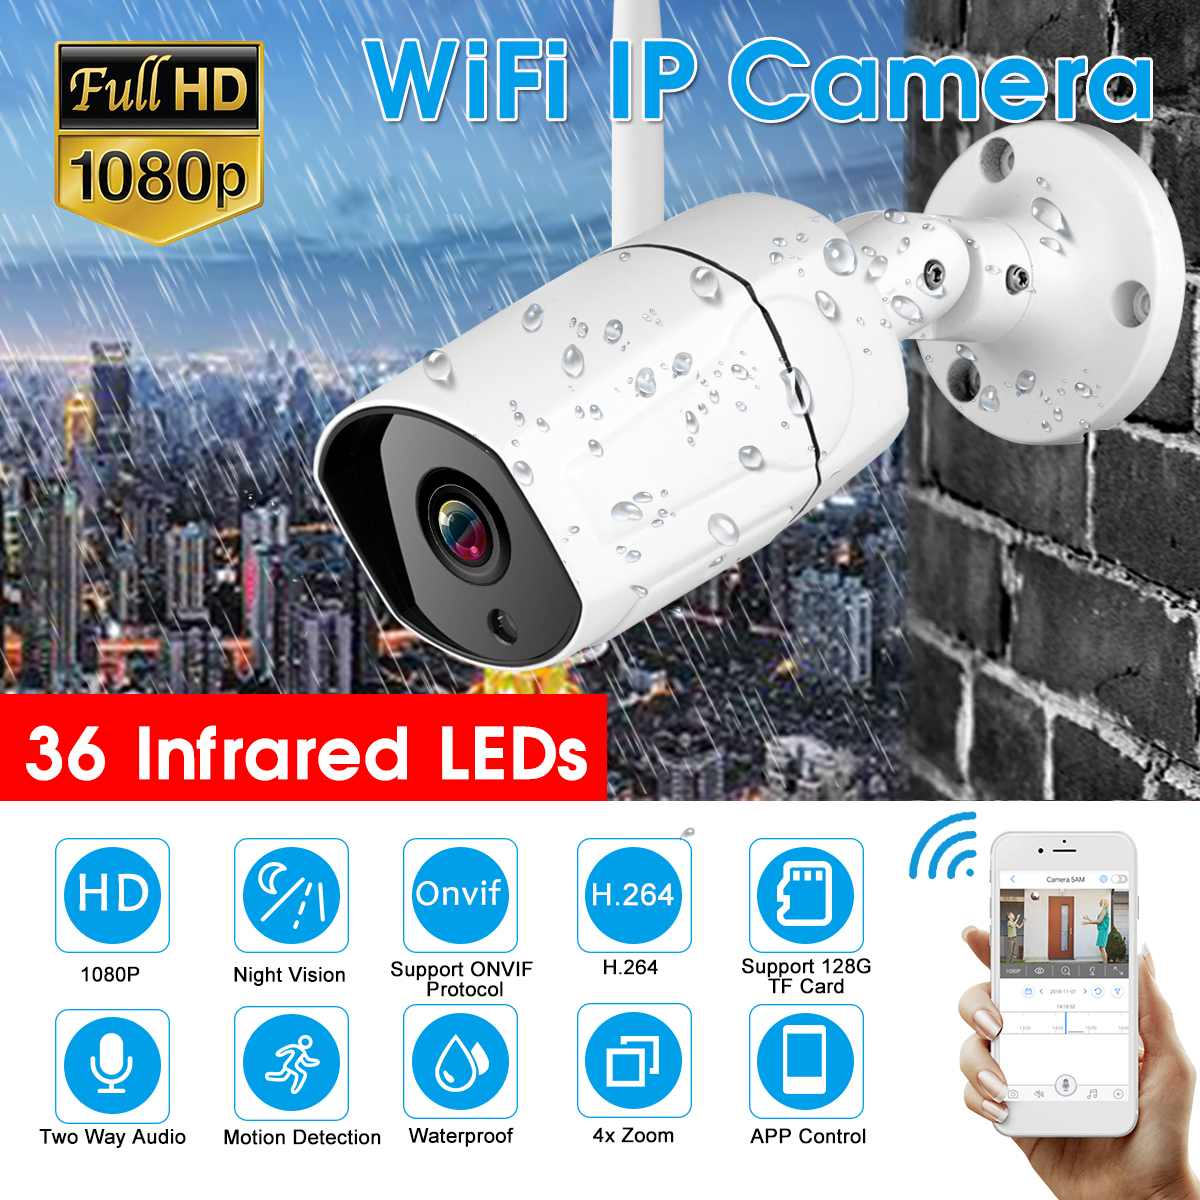 IP Camera Wifi Outdoor Waterproof HD Security Camera Wireless 1080P Night Vision Surveillance Camera CCTV Onvif Compatible